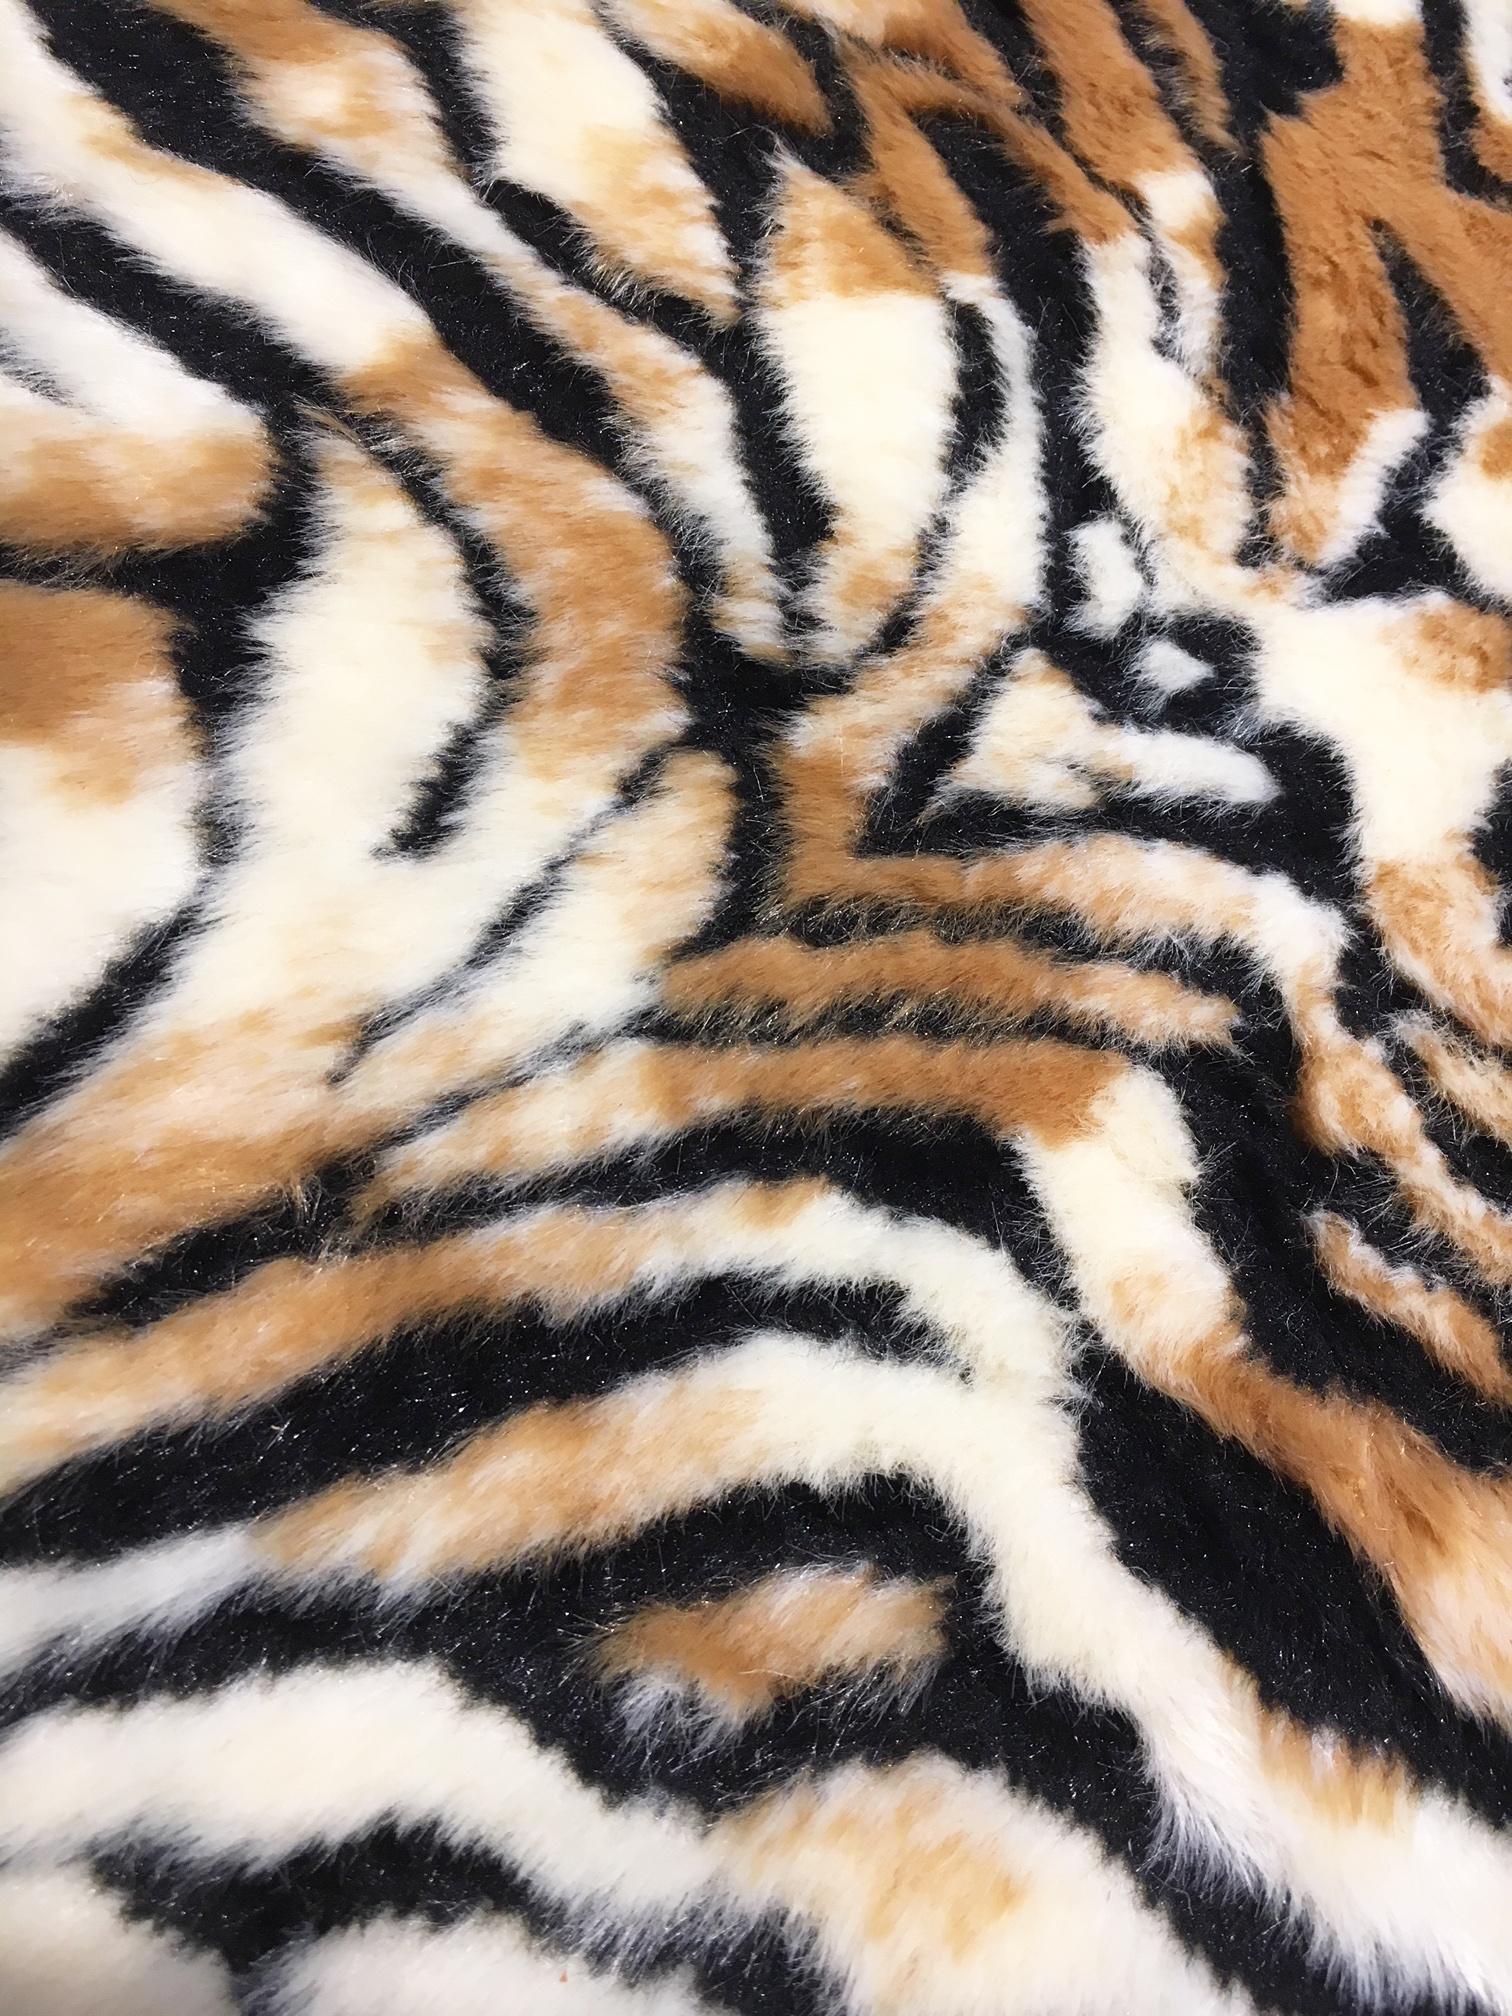 Faux tiger fur skin